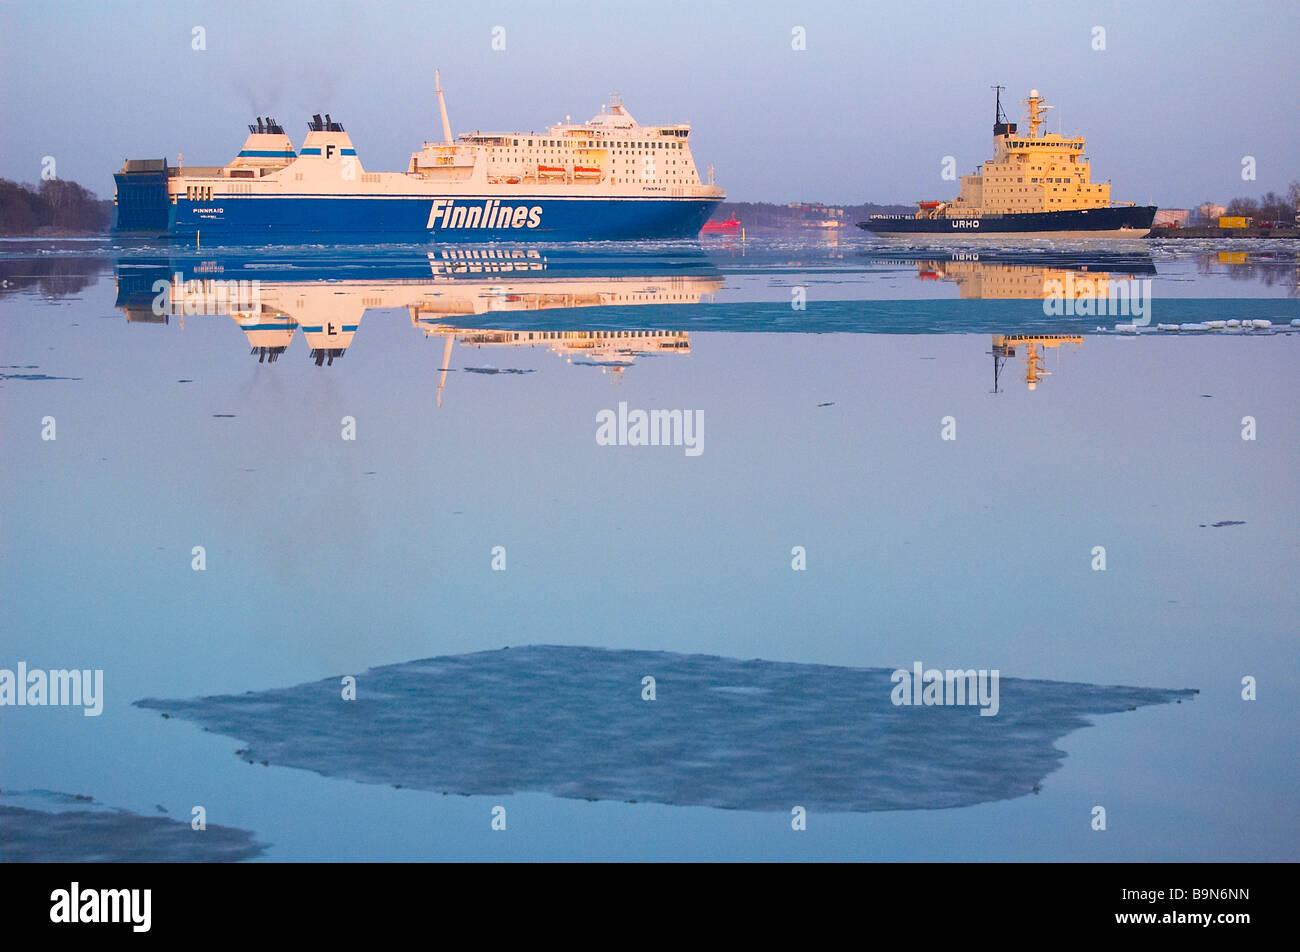 Ferry and icebreaker in Helsinki, Finland. - Stock Image